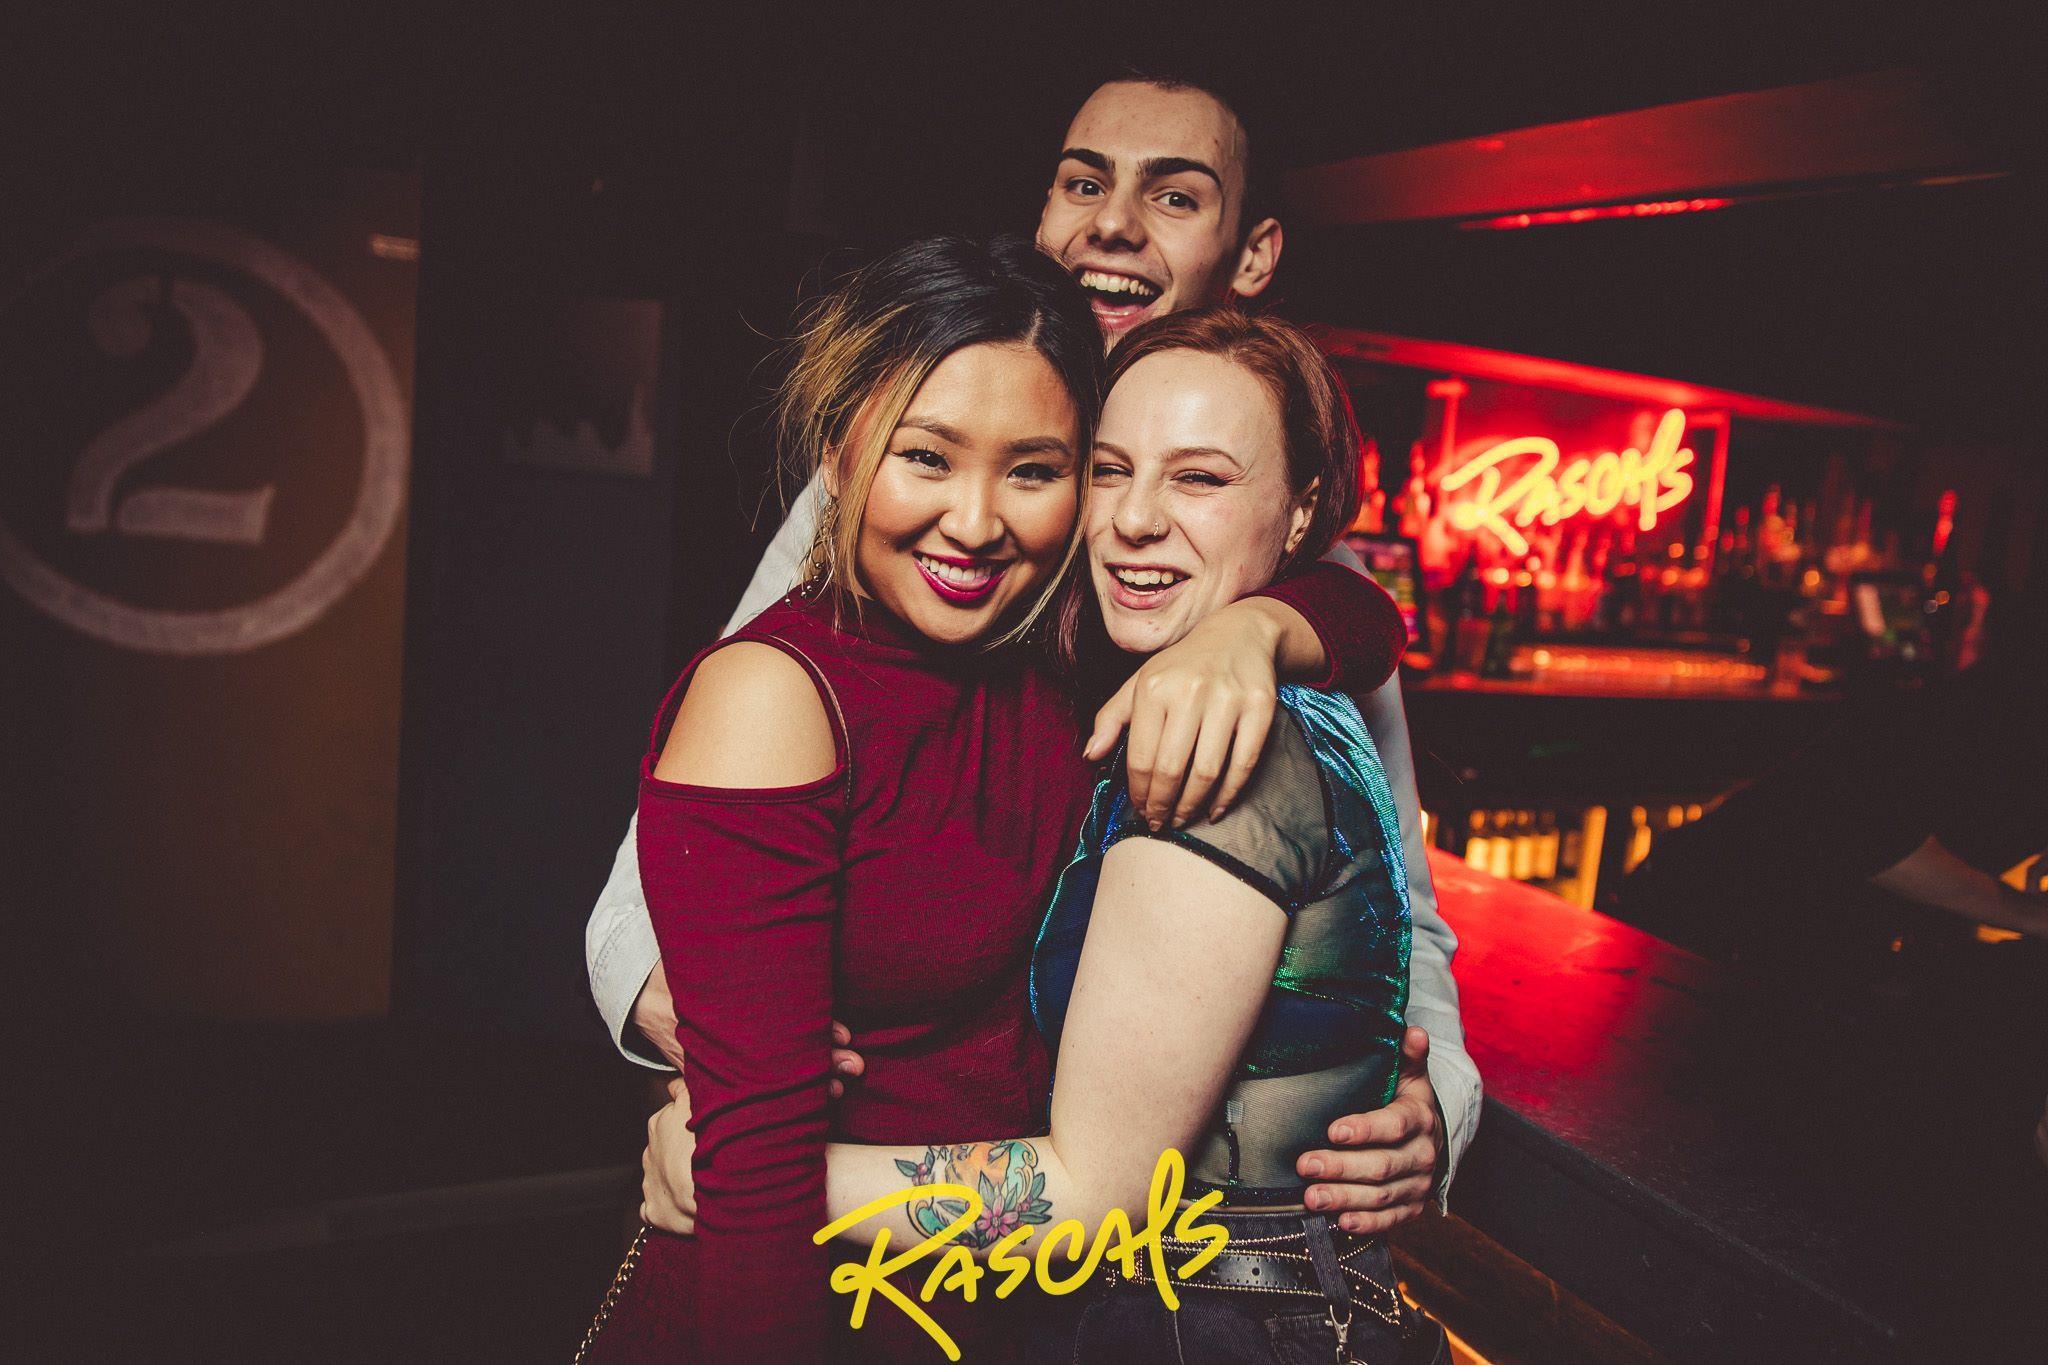 Image may contain: Night Life, Human, Person, Night Club, Club